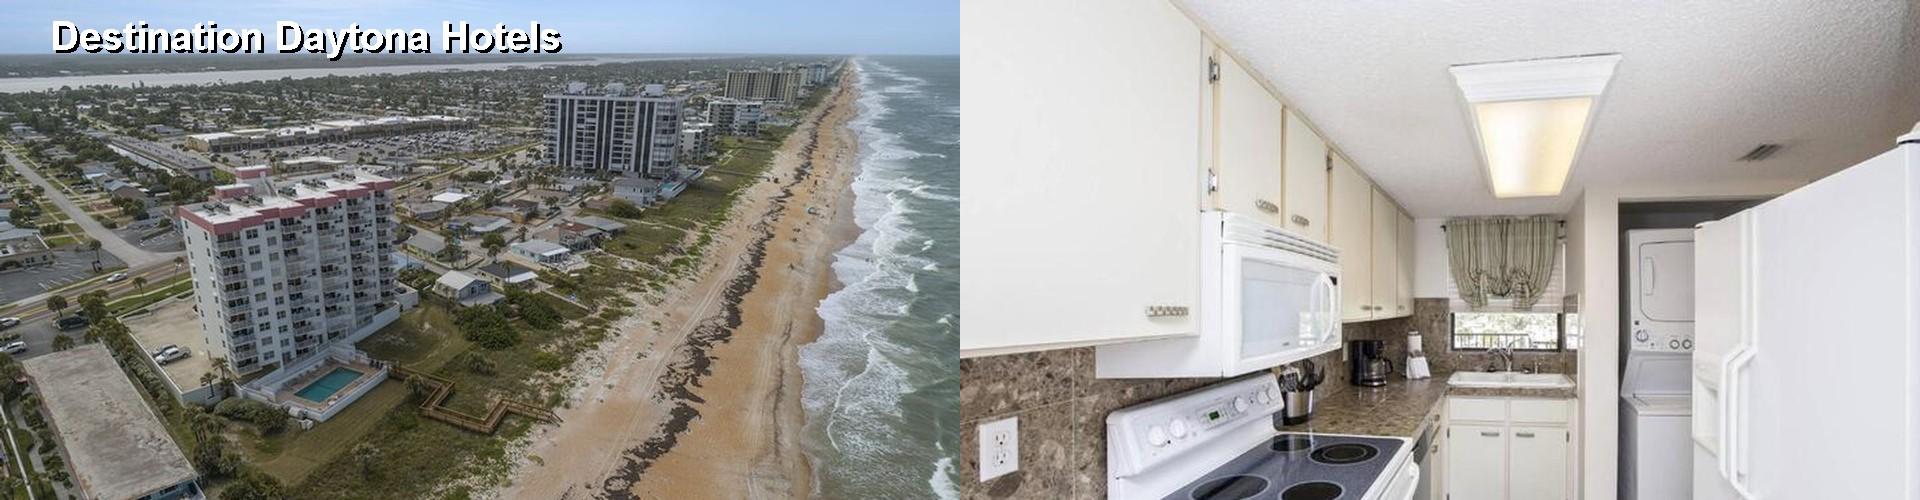 5 Best Hotels Near Destination Daytona